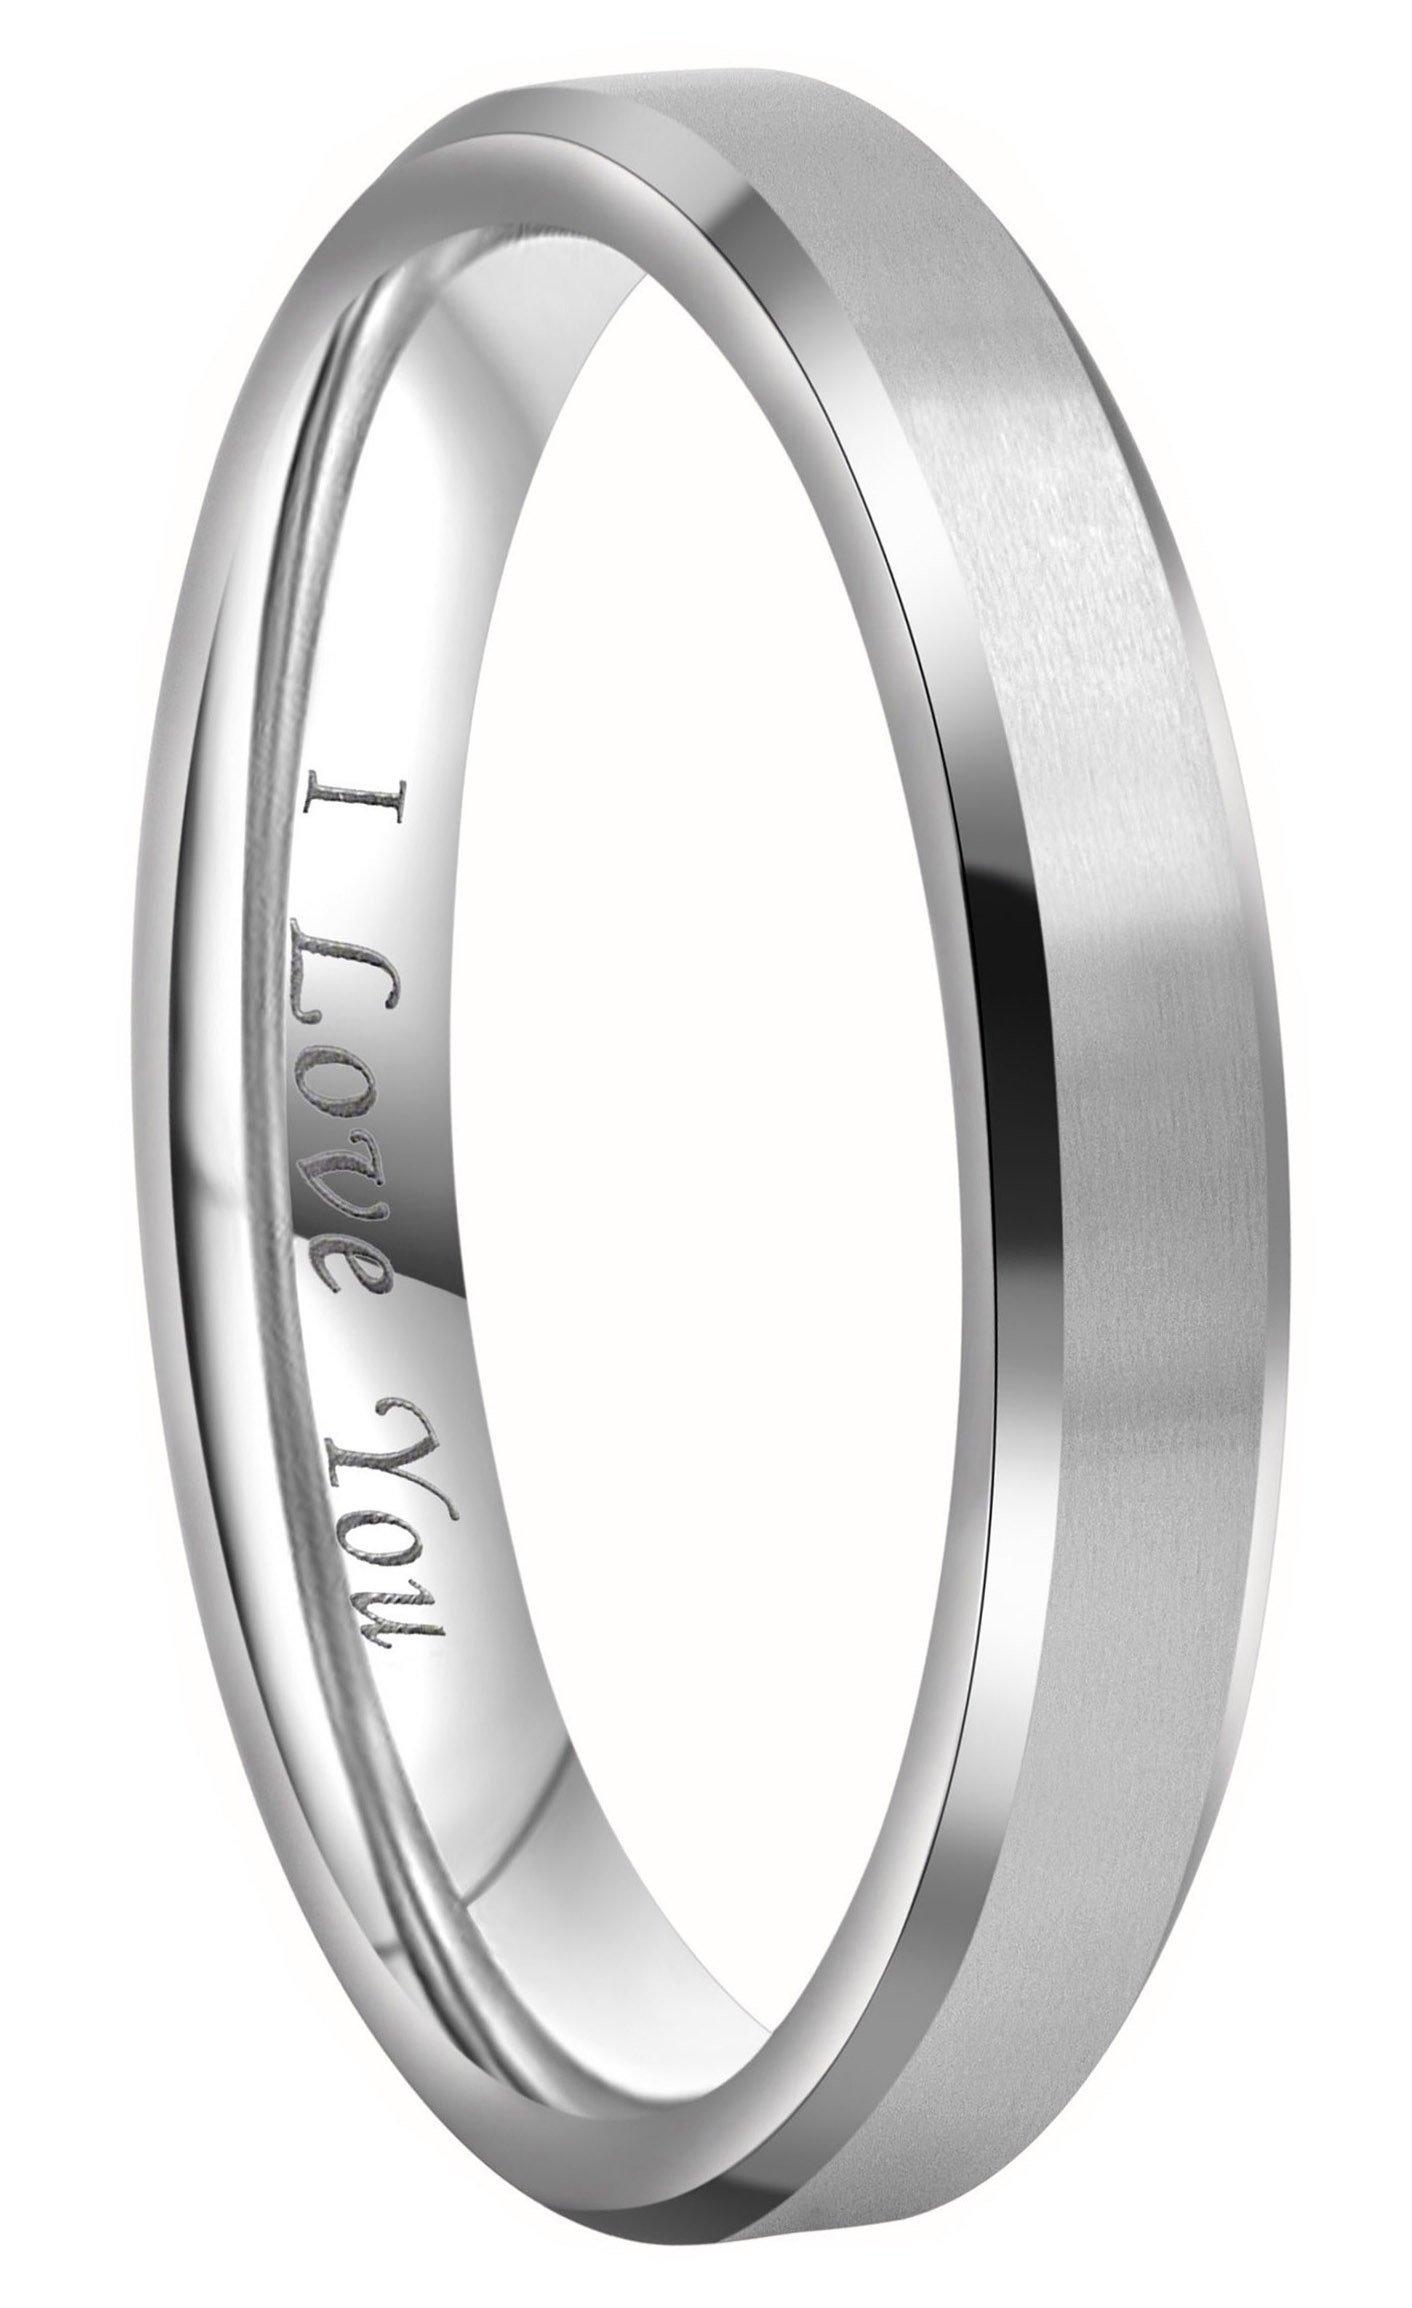 Crownal 4mm 6mm 8mm Titanium Wedding Couple Bands Rings Men Women Matte Brush Center Beveled Edges Engraved ''I Love You'' Comfort Fit Size 4 To 16 (4mm,5)